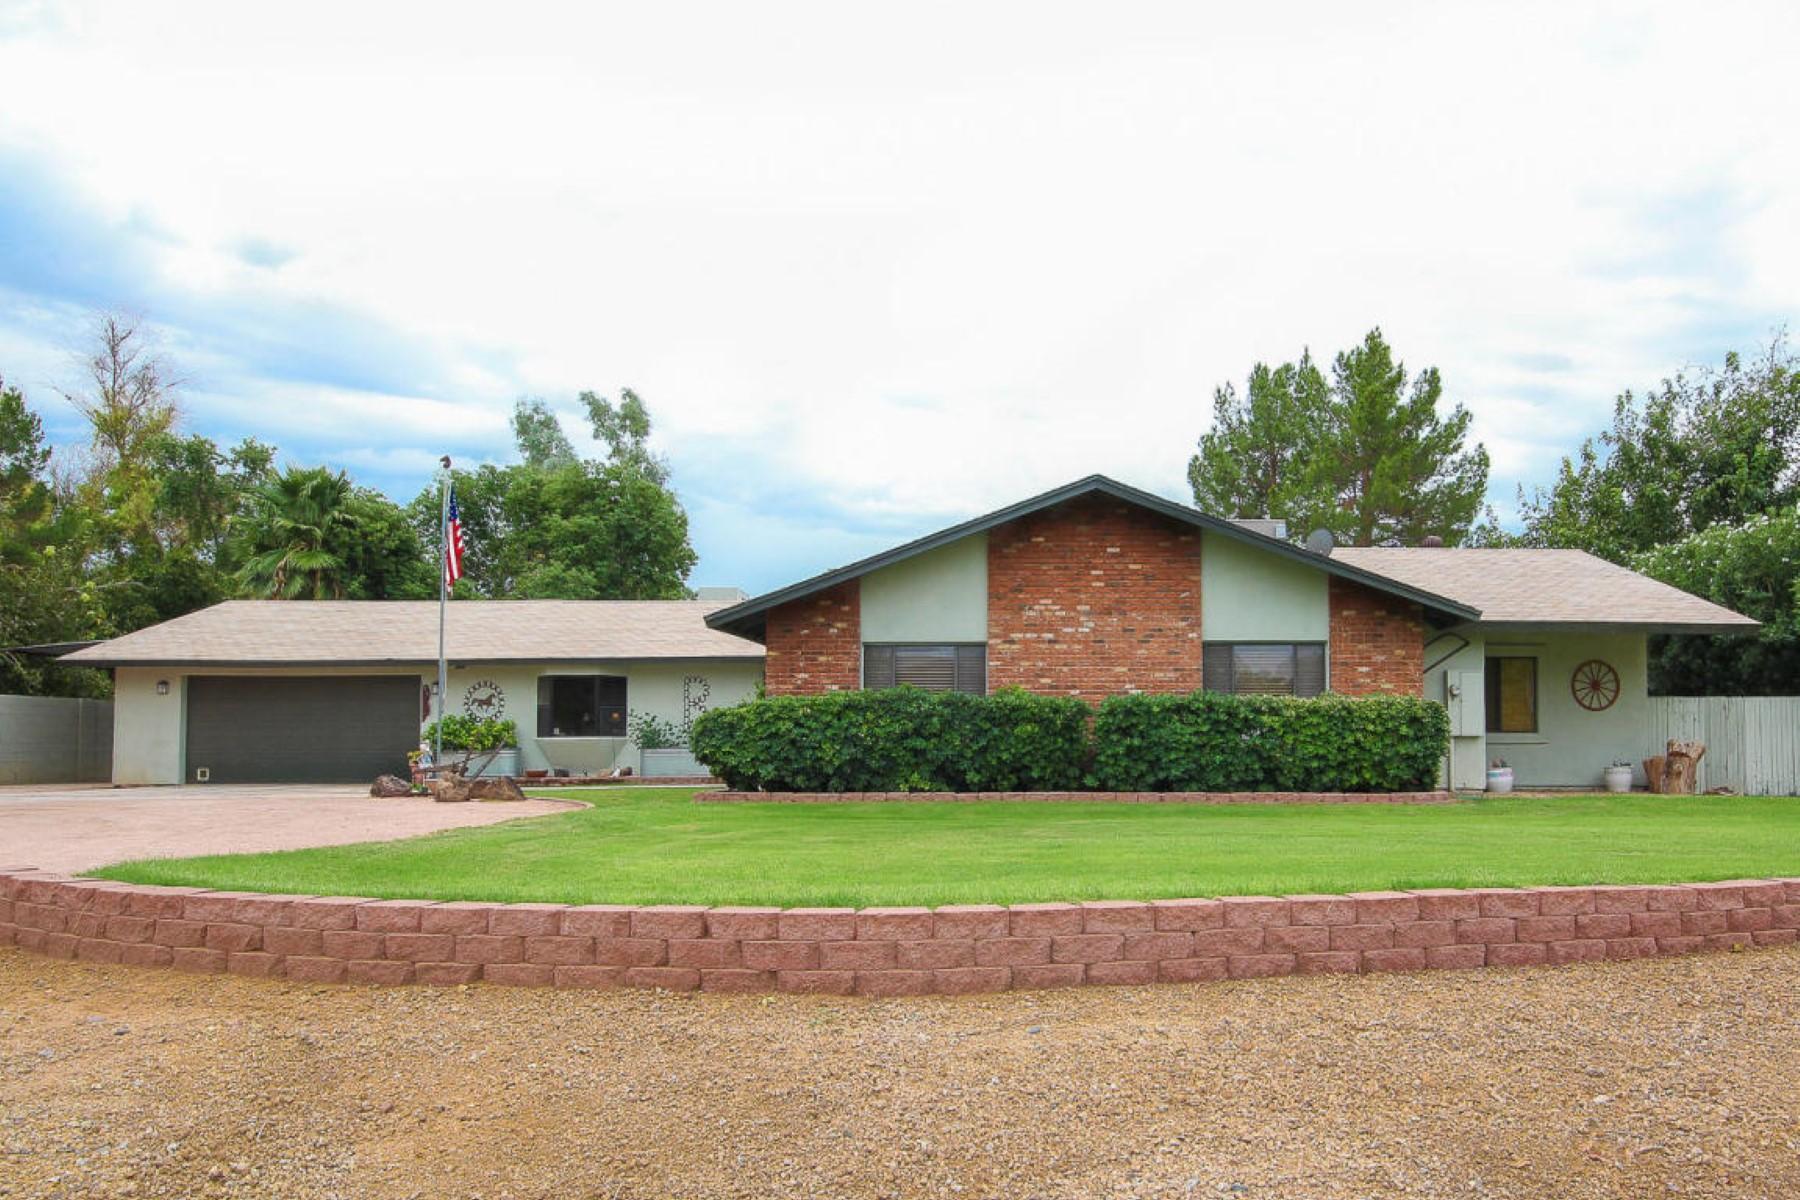 Casa para uma família para Venda às Wonderful home on almost 1 acre in popular Sunburst Farms East 5211 E Sweetwater Ave Scottsdale, Arizona 85254 Estados Unidos